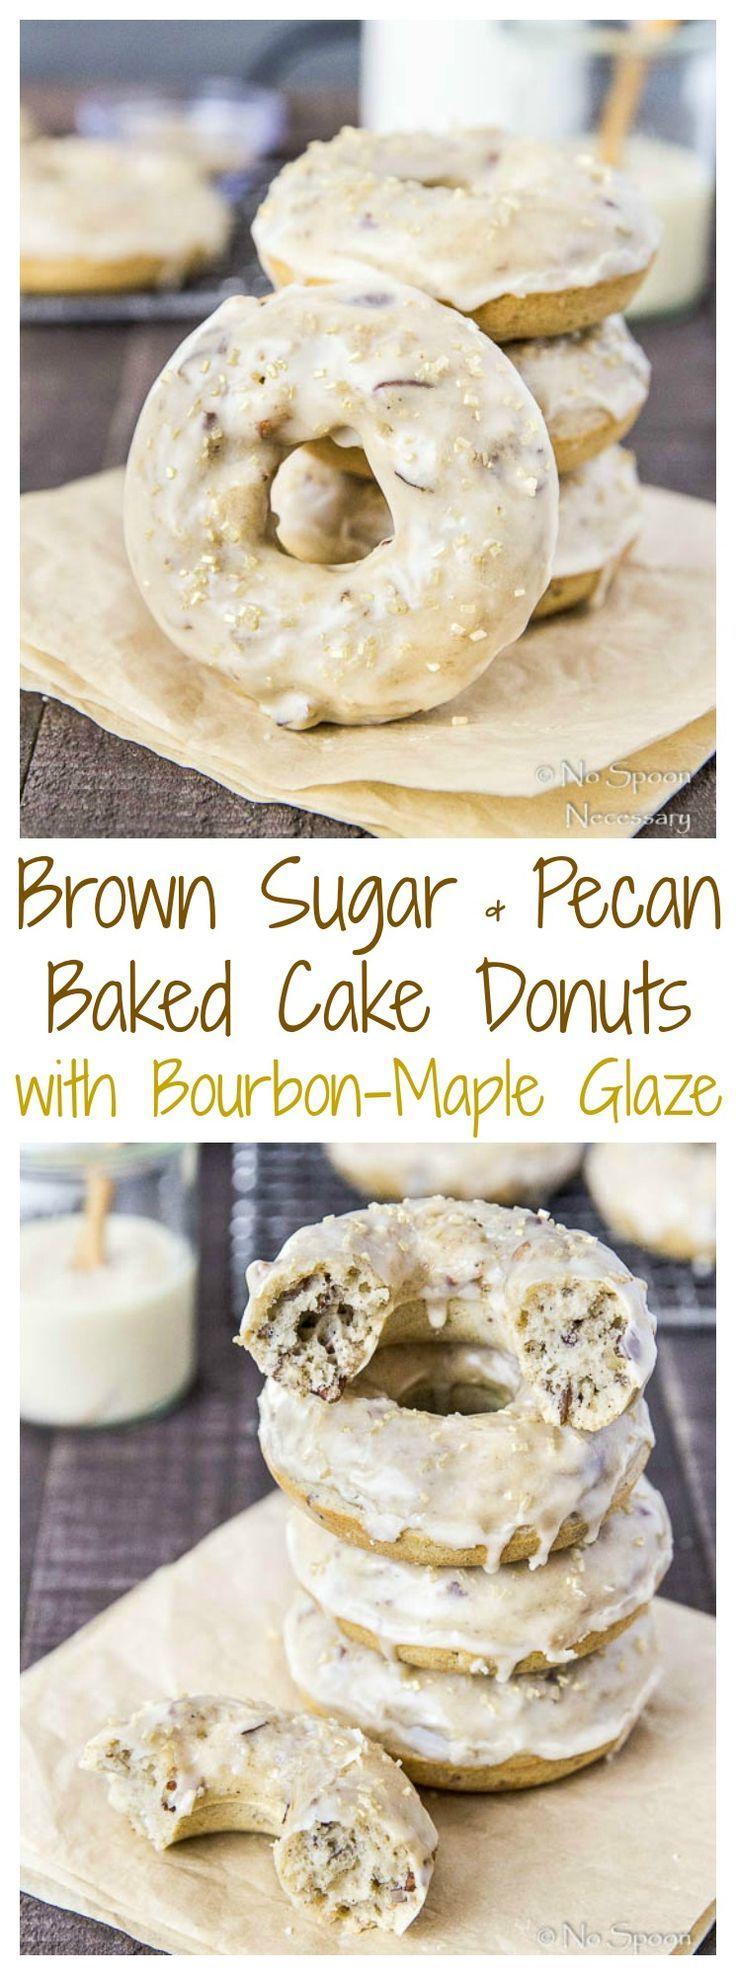 Pumpkin-Pecan Cake With Brown Sugar And Bourbon Glaze Recipe ...